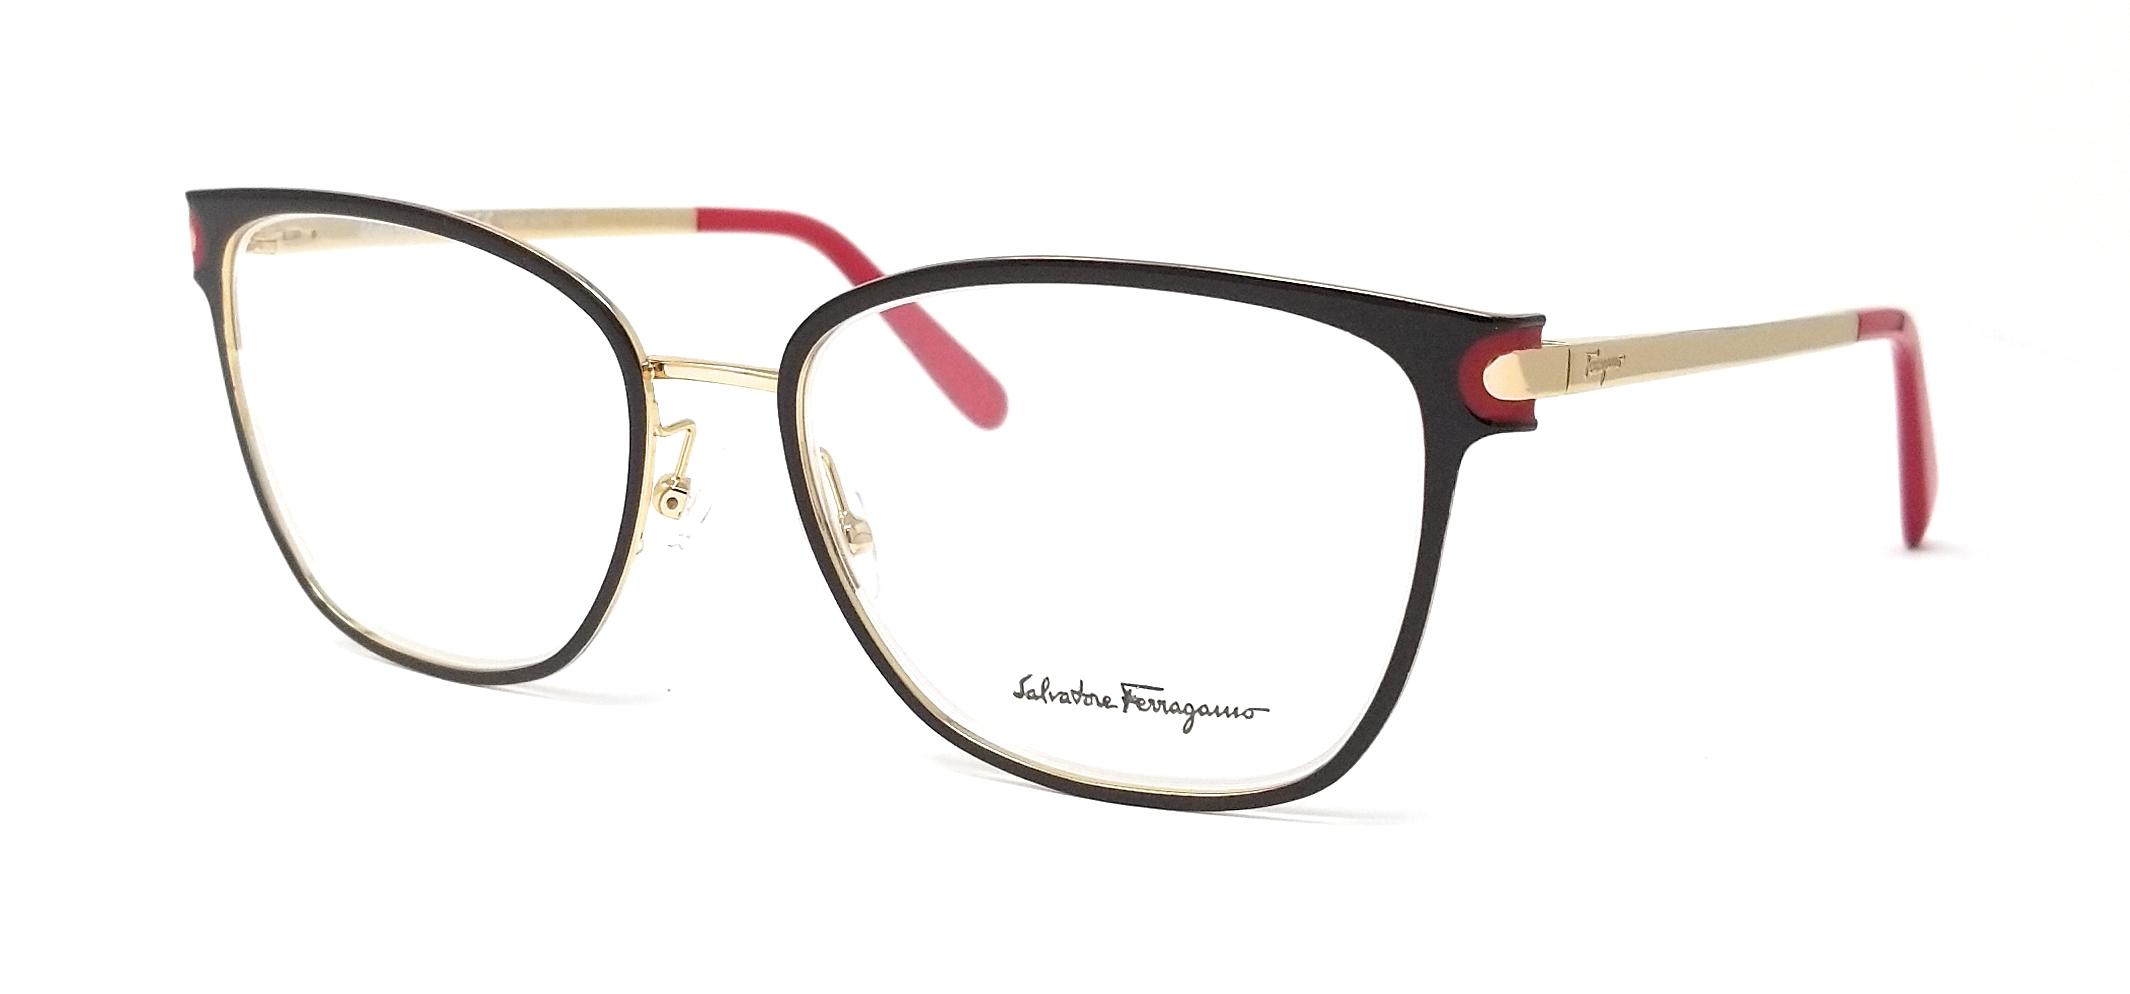 810b447e52c Salvatore Ferragamo Eyeglasses SF2150 251 Brown-Shiny Gold Rectangular 53mm